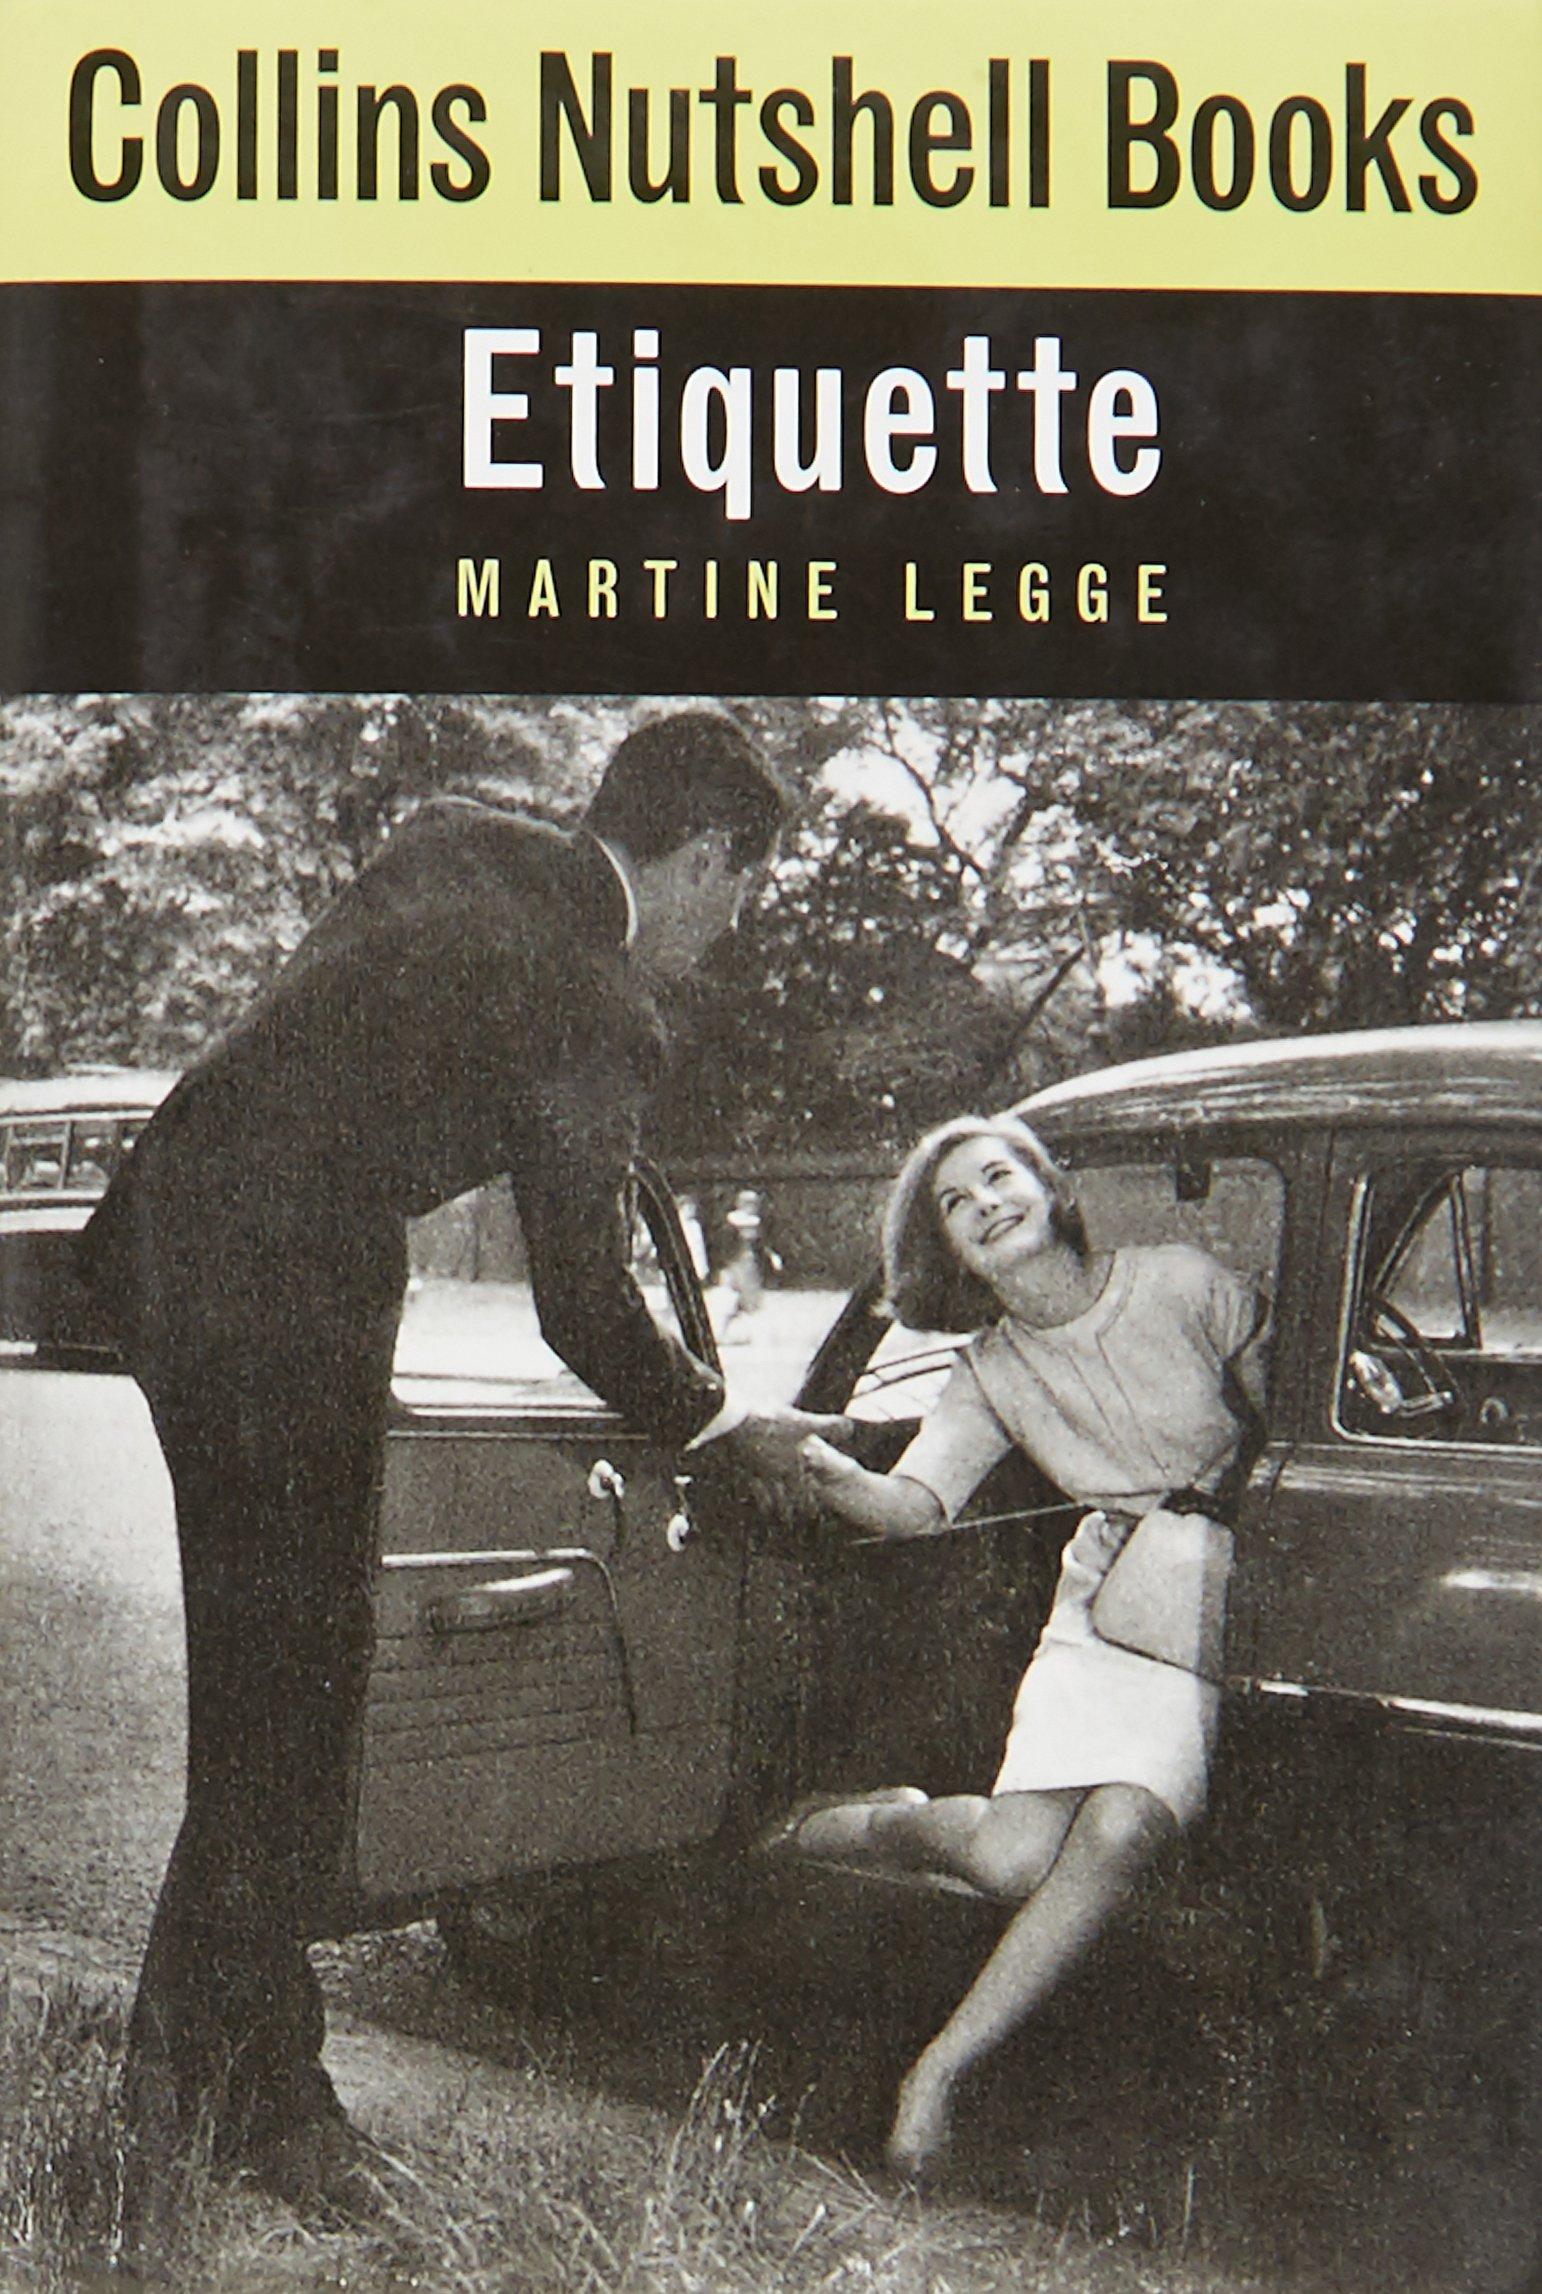 Read Online Collins Nutshell Books - Etiquette pdf epub